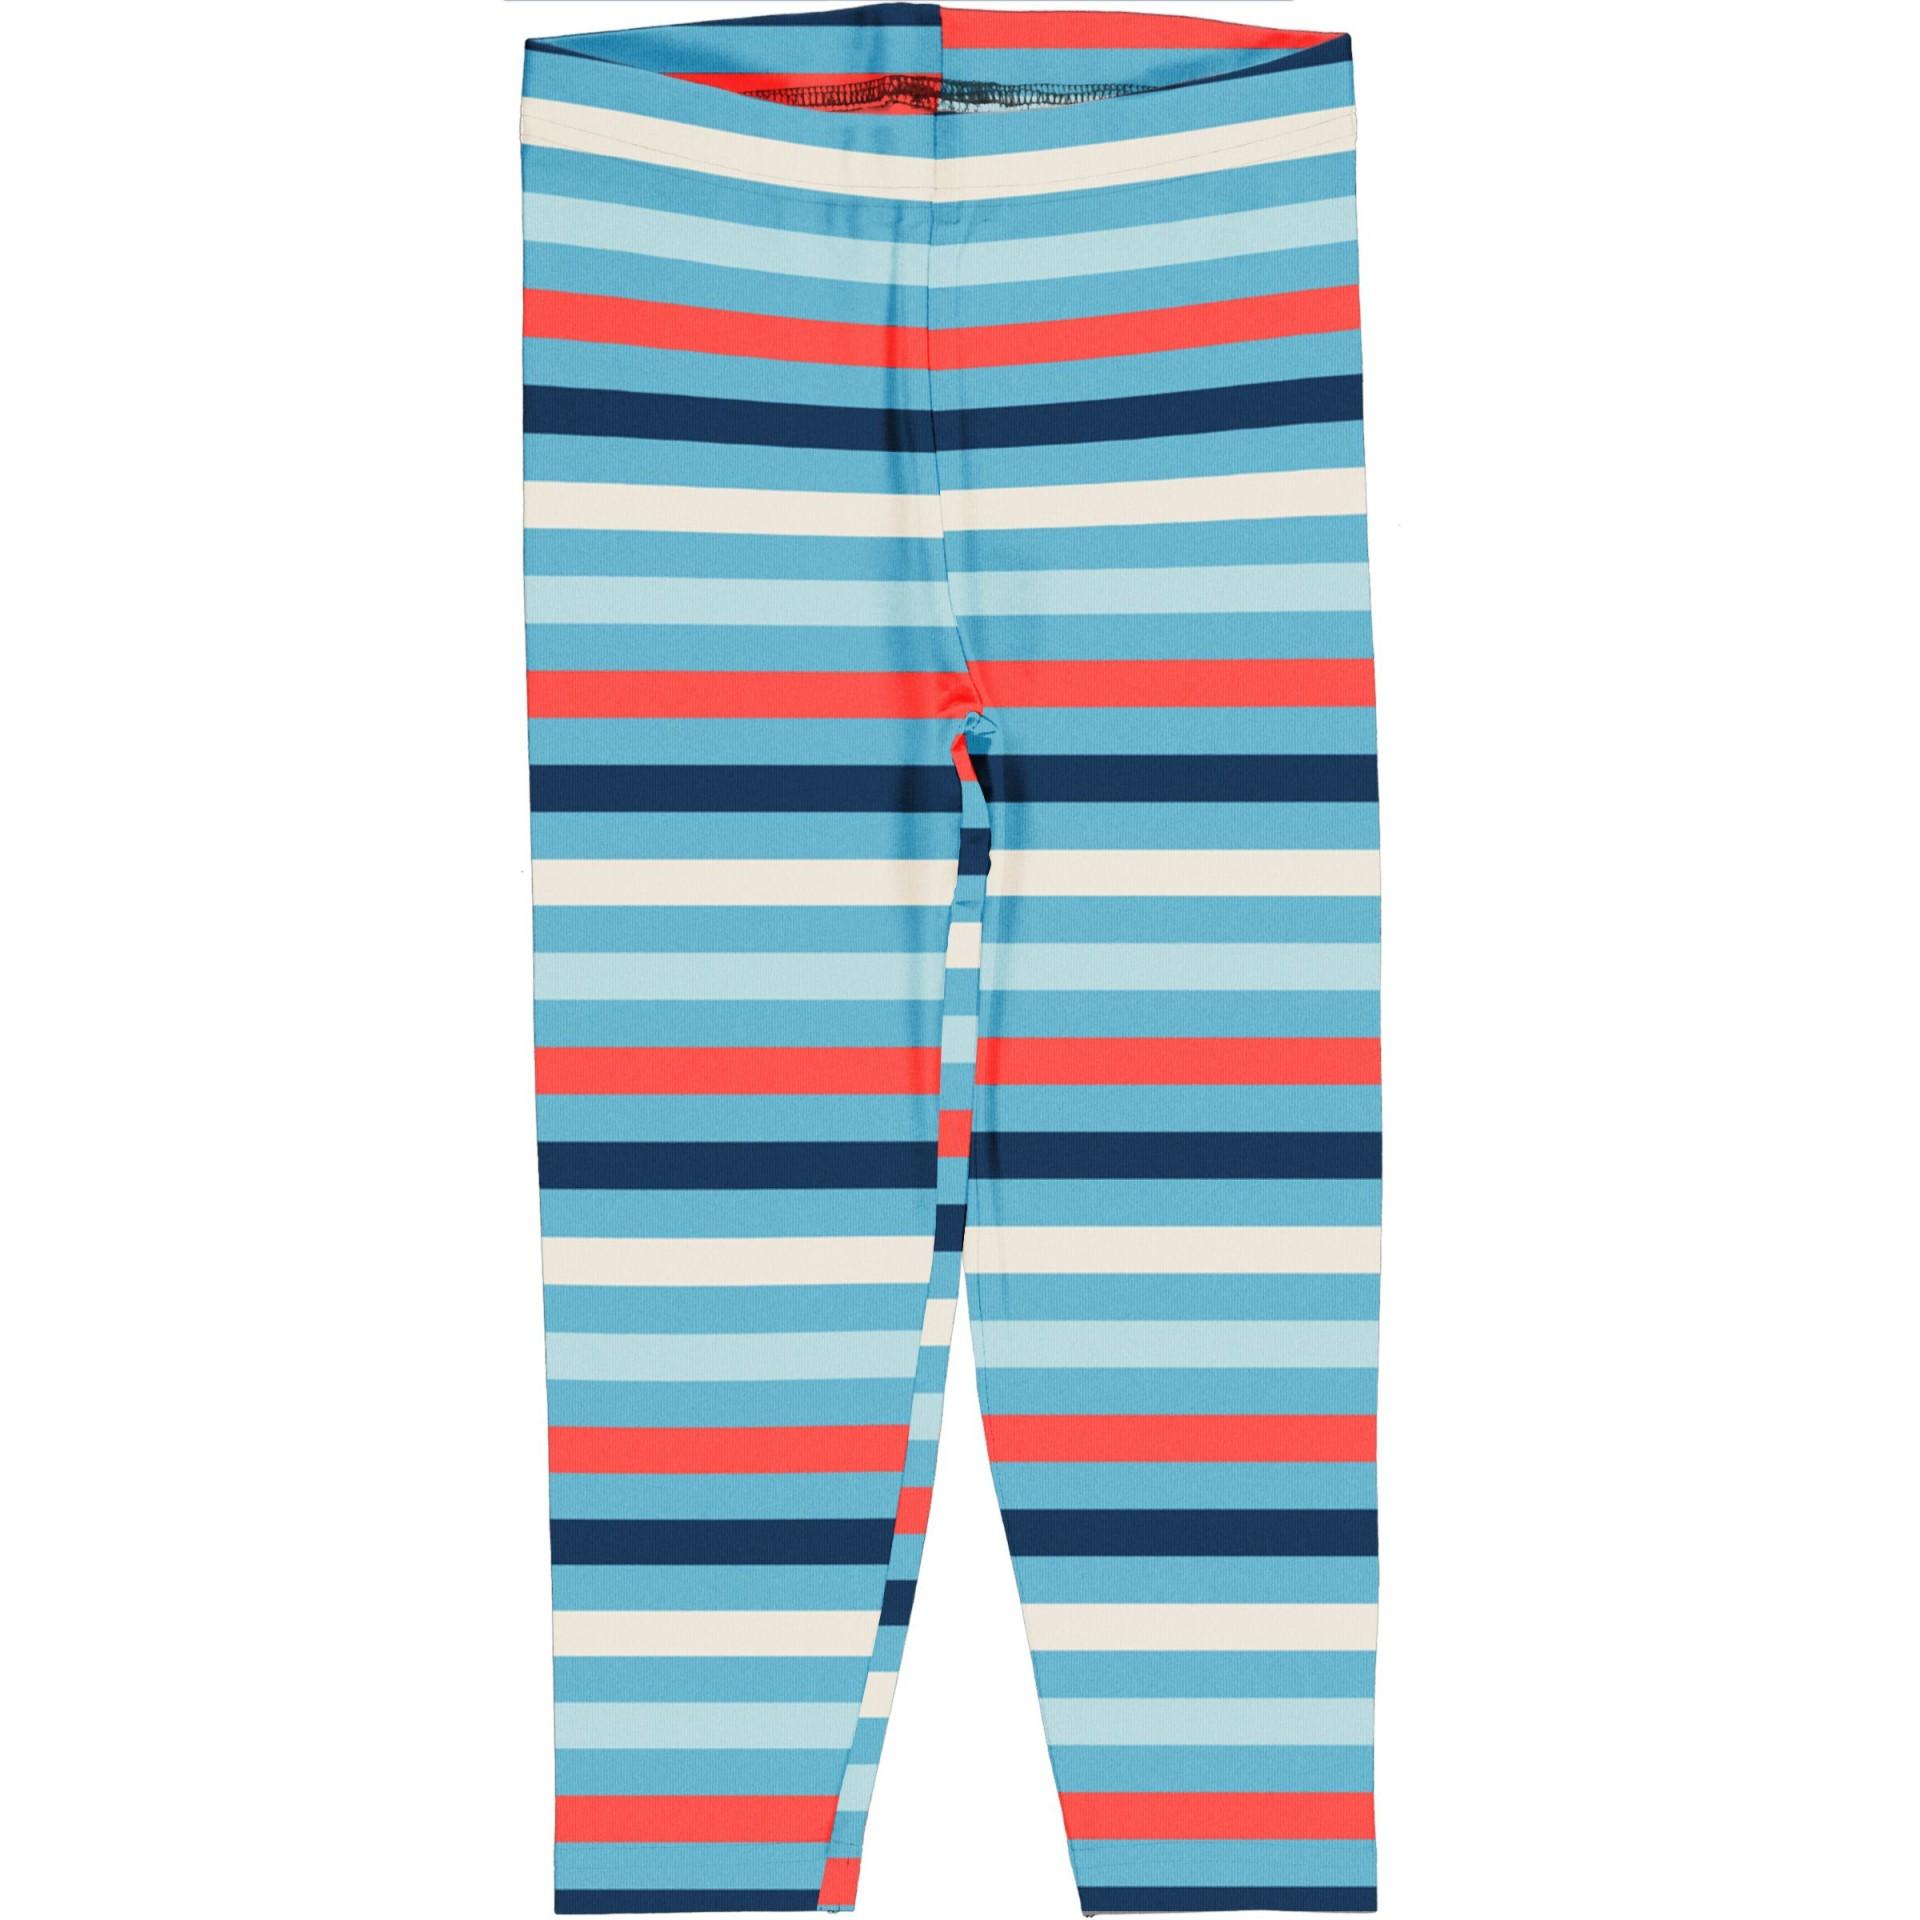 Leggings 3/4 Stripe Sky Maxomorra (Tamanhos disponíveis 3-6m, 9-12m, 7-8a)